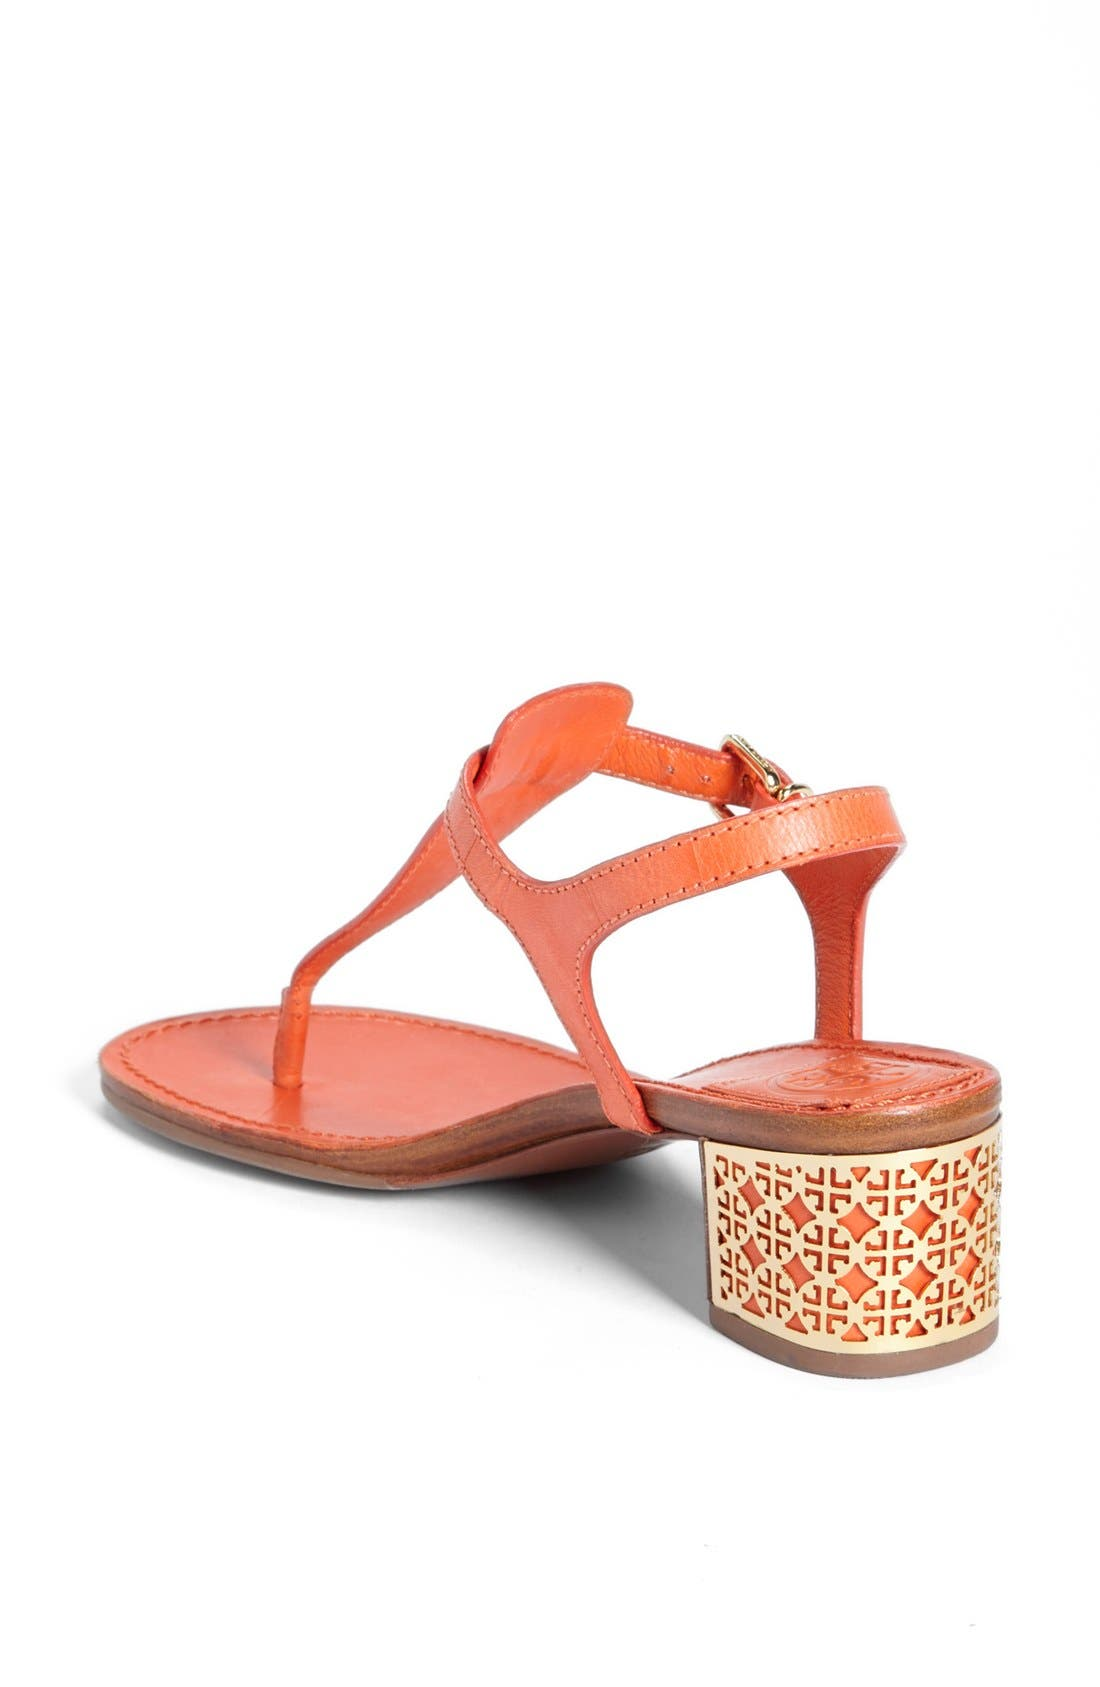 'Audra' Sandal,                             Alternate thumbnail 2, color,                             Tiger Lily